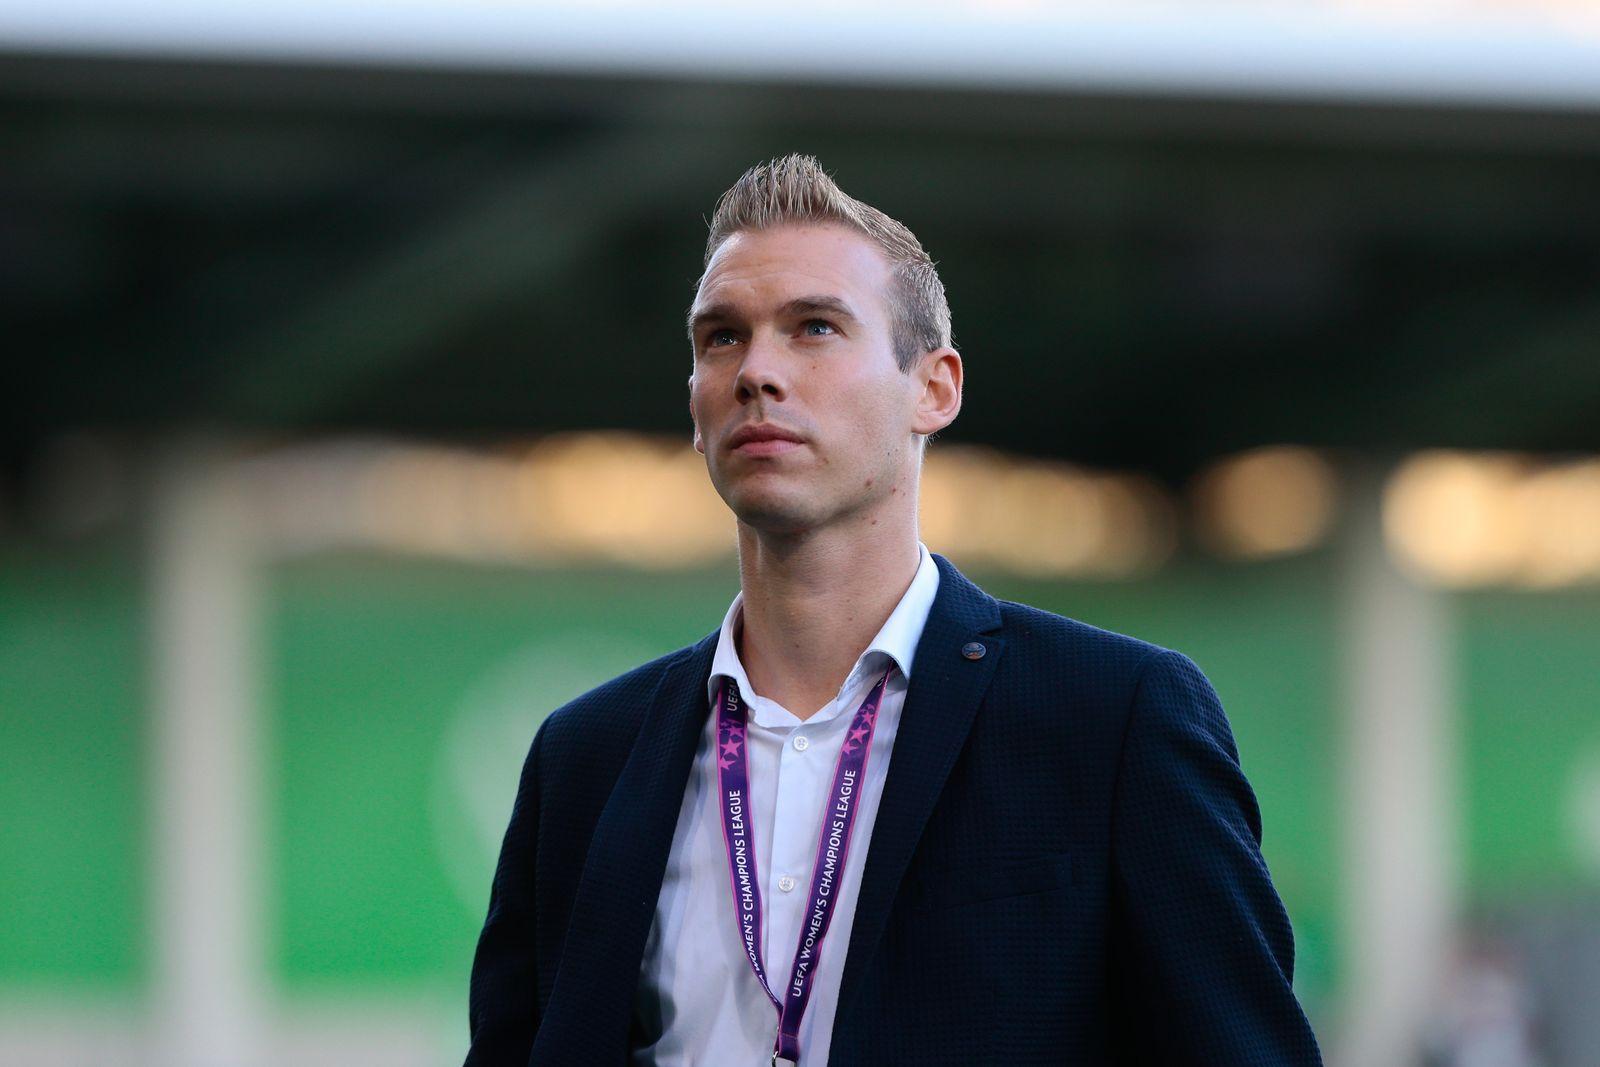 16.10.2019, xtgx, Fussball, UEFA Women s Champions League, VfL Wolfsburg - FC Twente Enschede emspor, v.l. Tommy Stroot